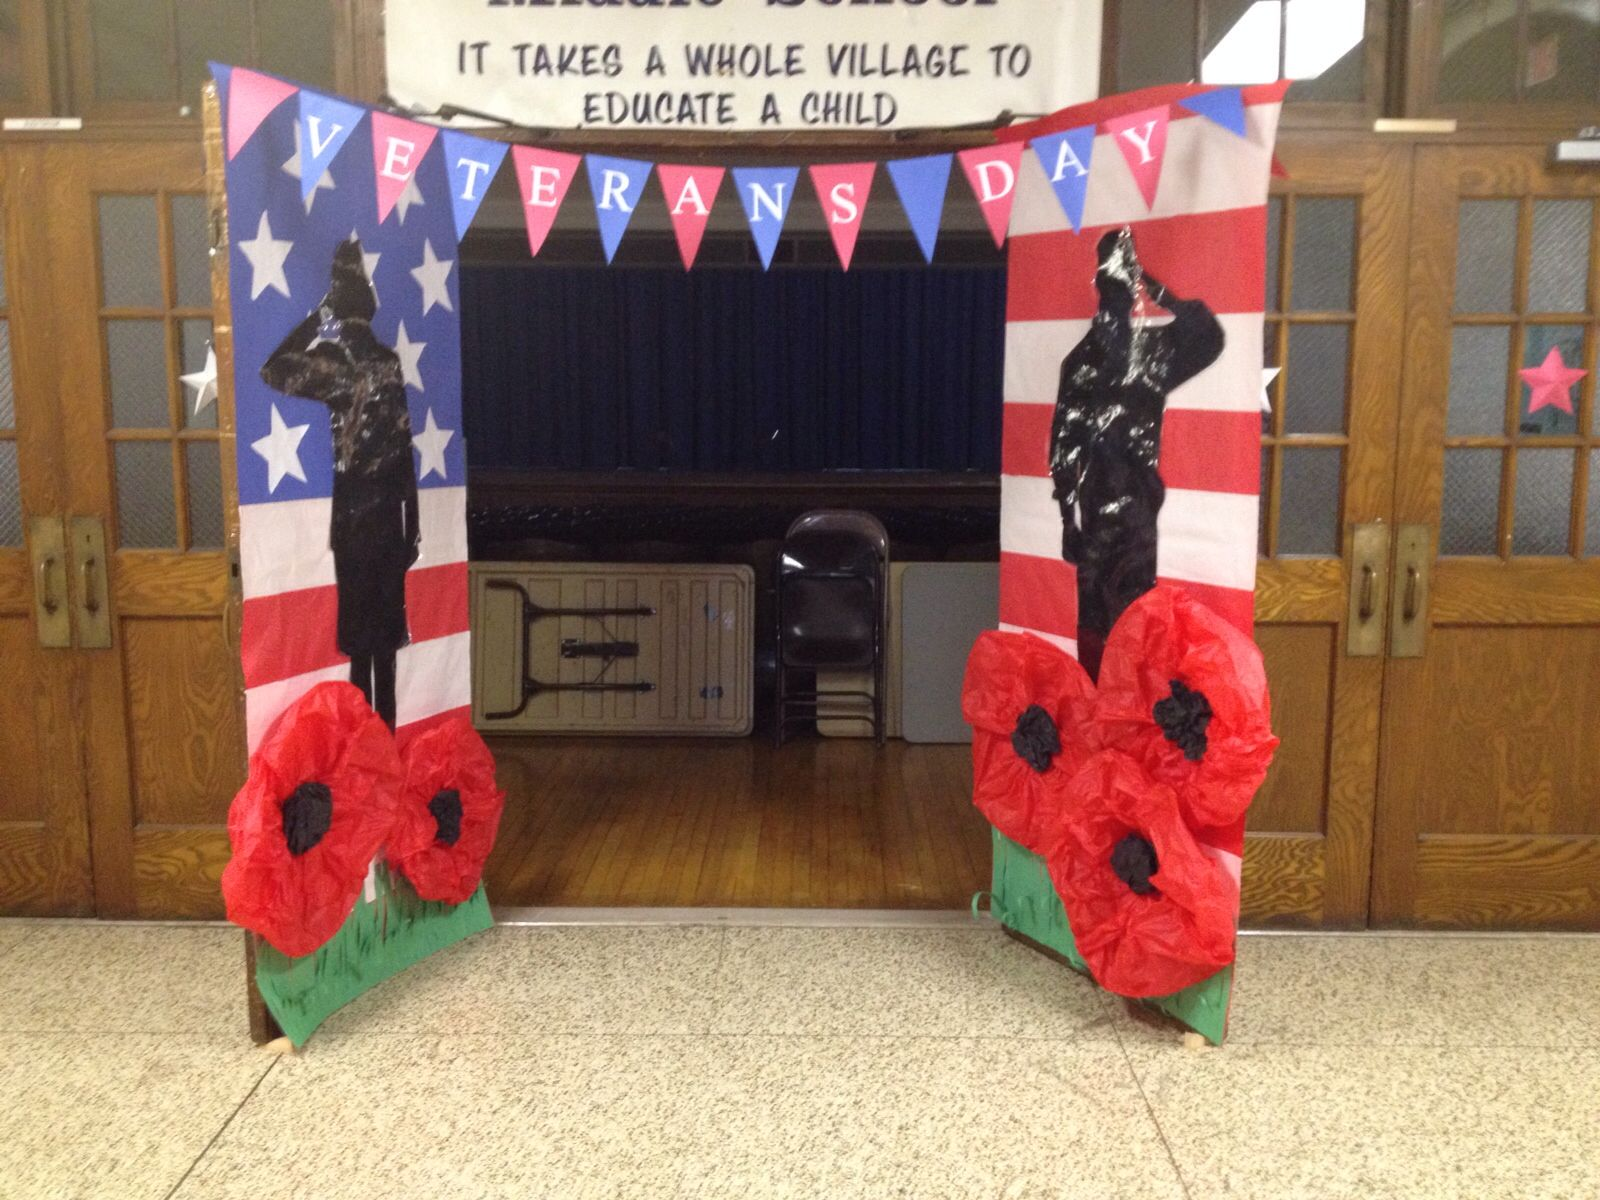 Veterans Day Classroom Door Decoration Ideas : Veterans day hallway decoration oh my gosh the